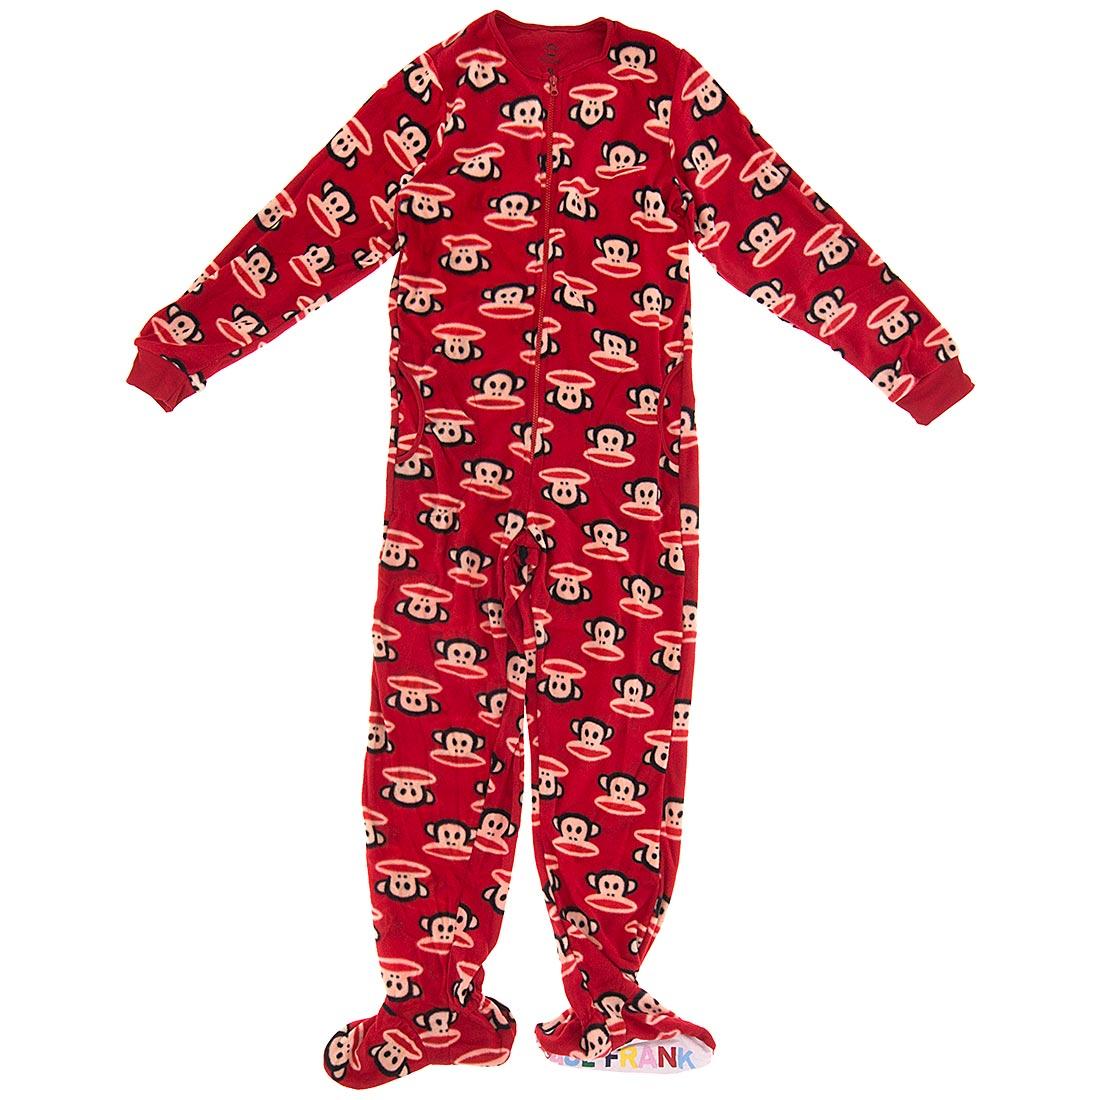 pajama clipart free download best pajama clipart on clipartmag com rh clipartmag com